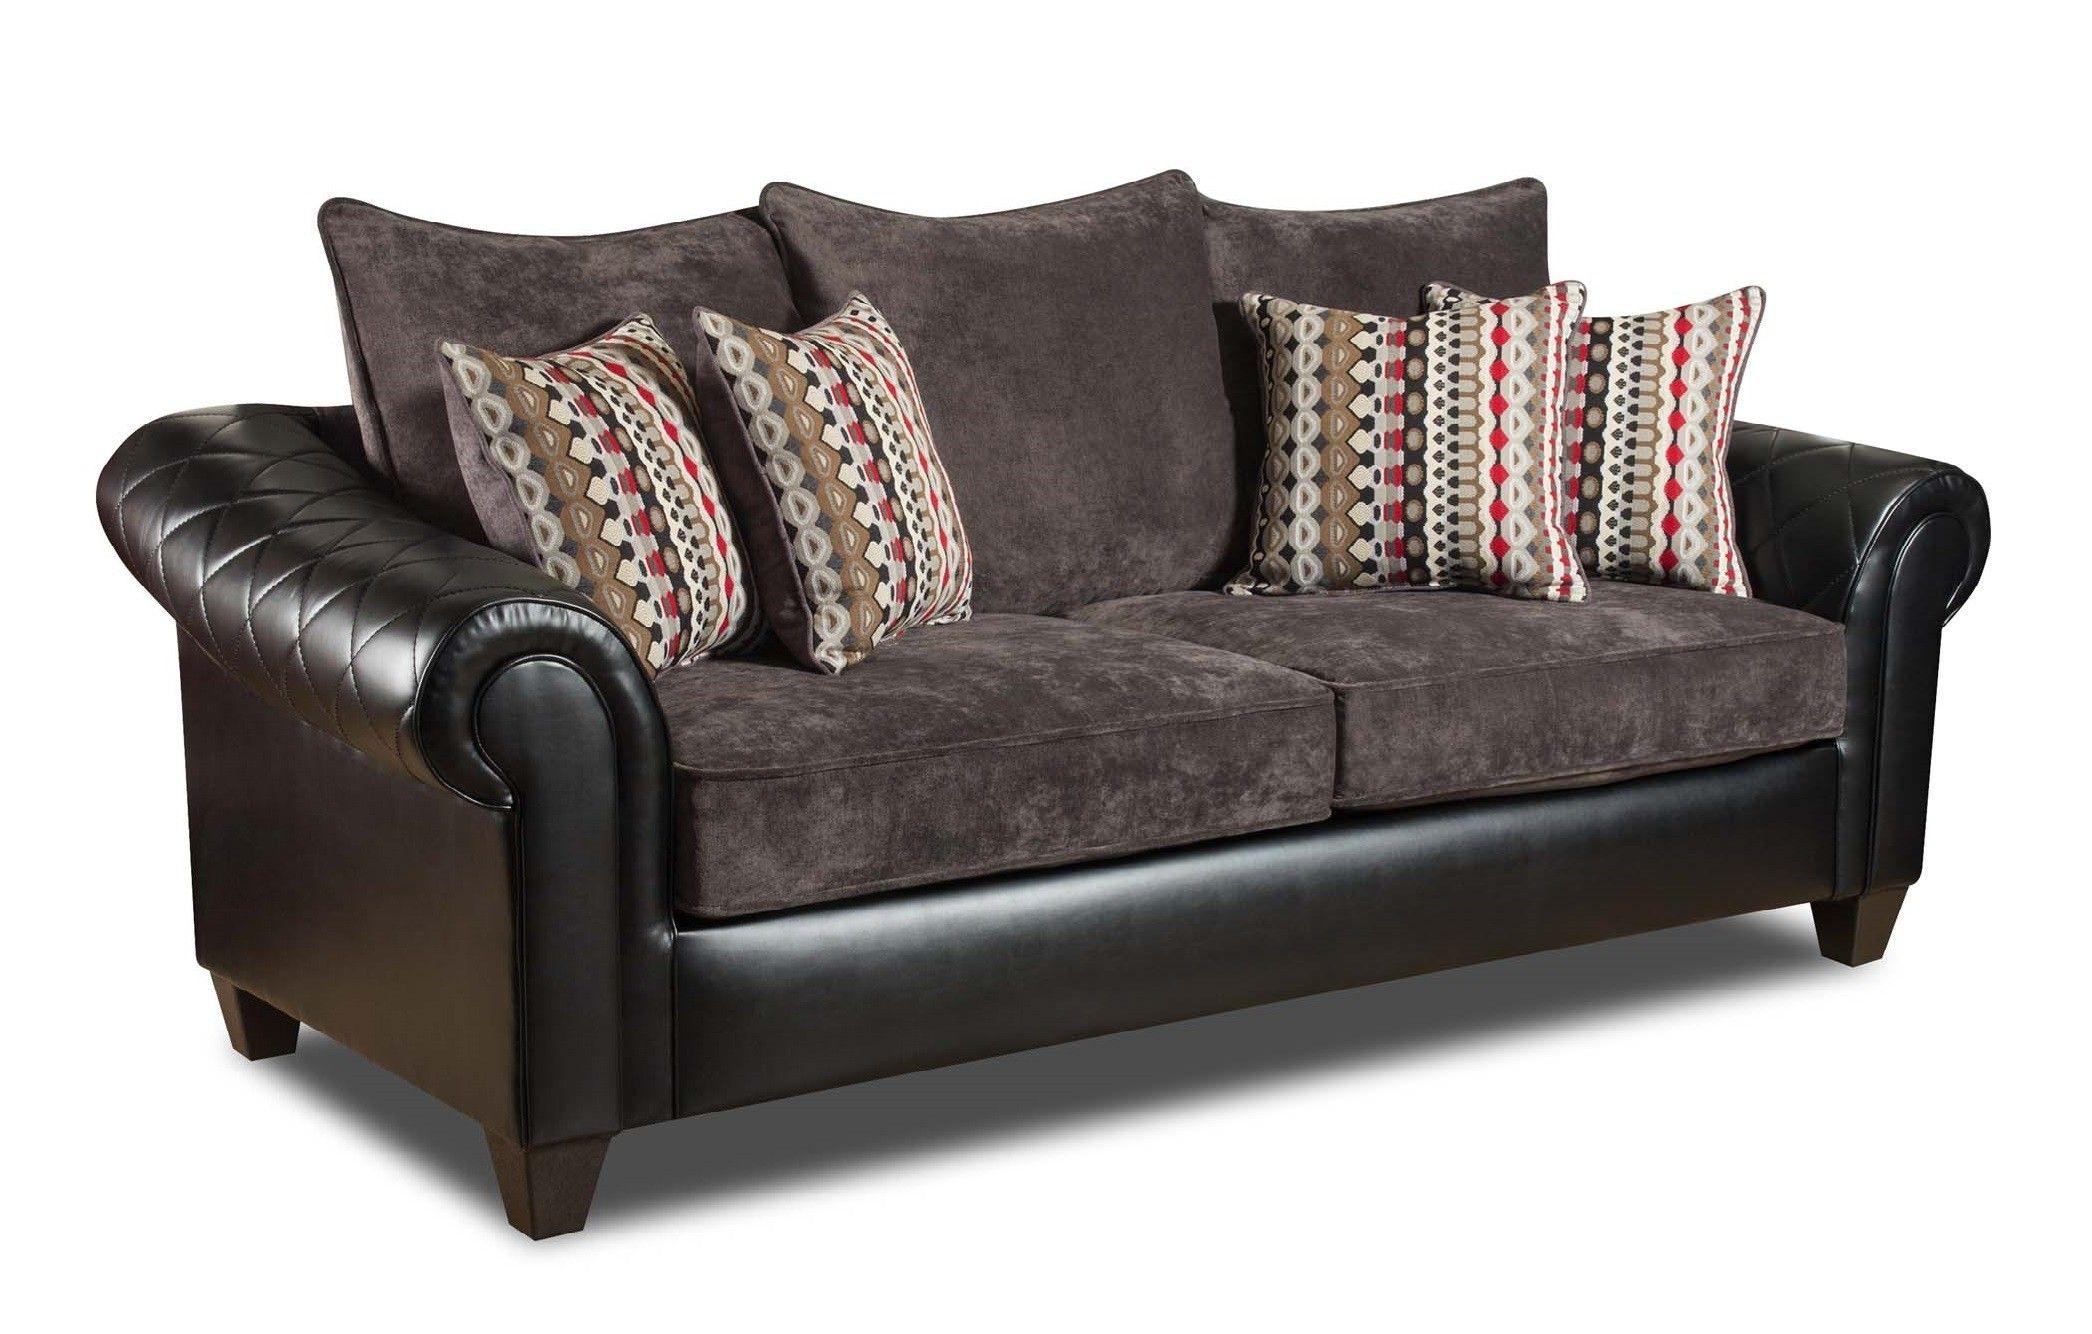 Afton Sofa in Ghana Black by Chelsea Home Furniture ...